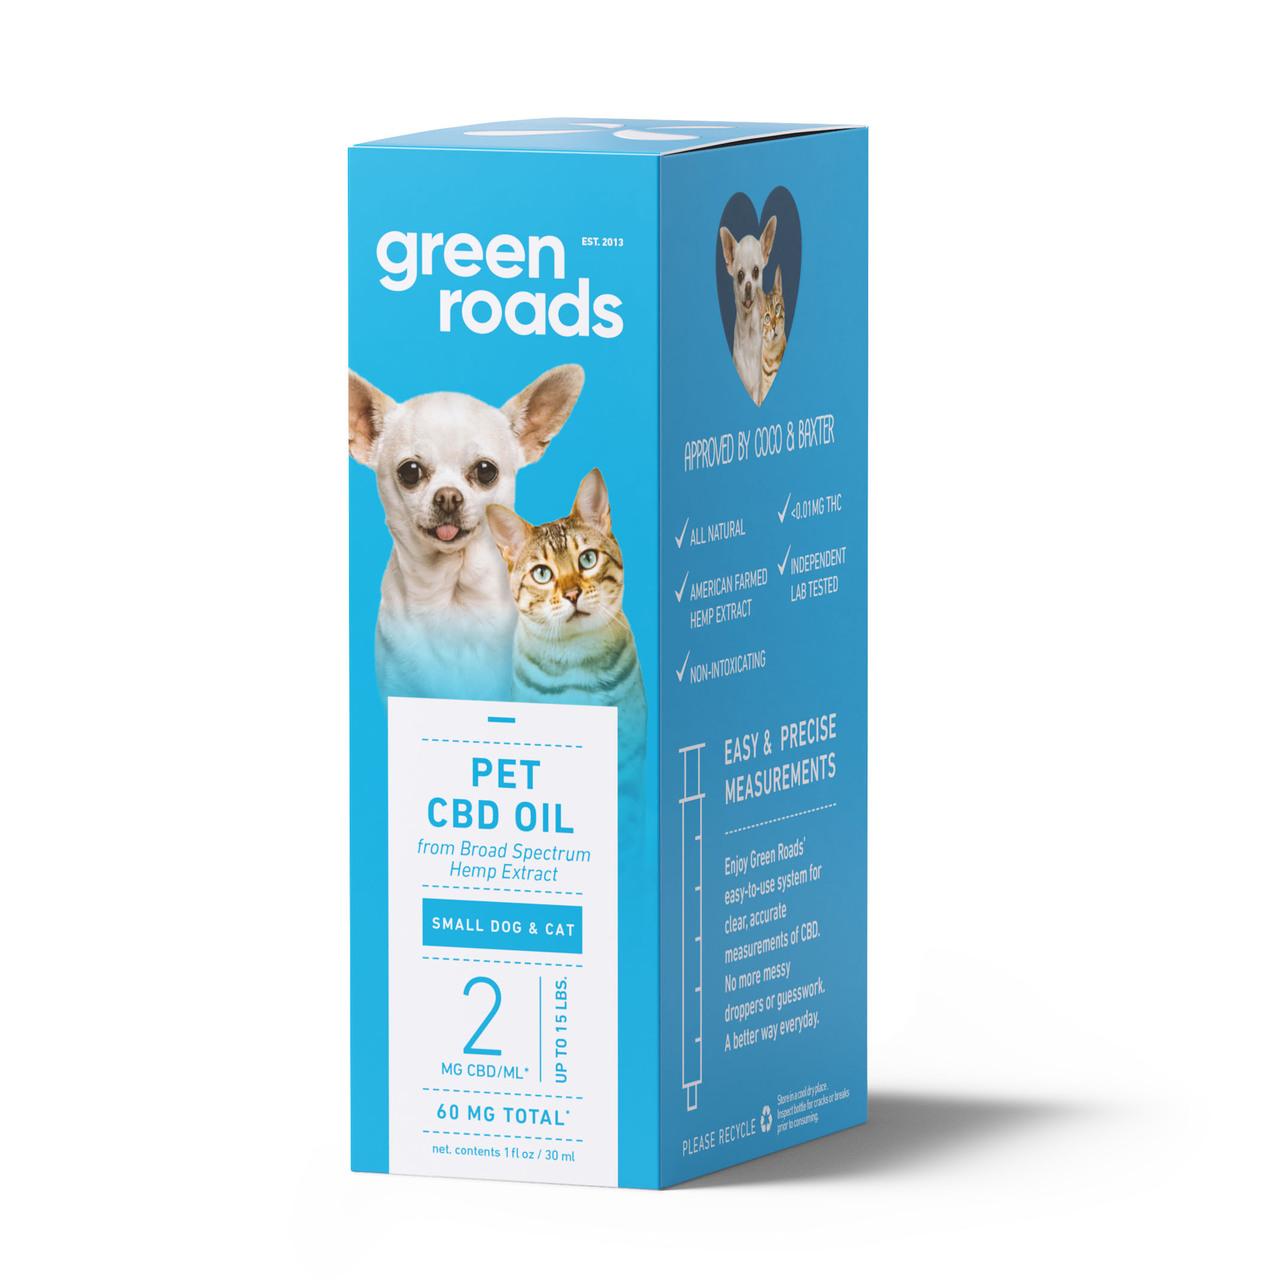 Green Roads, Pet CBD Drops Small Dog & Cat, Broad Spectrum, 1oz, 60mg of CBD 2